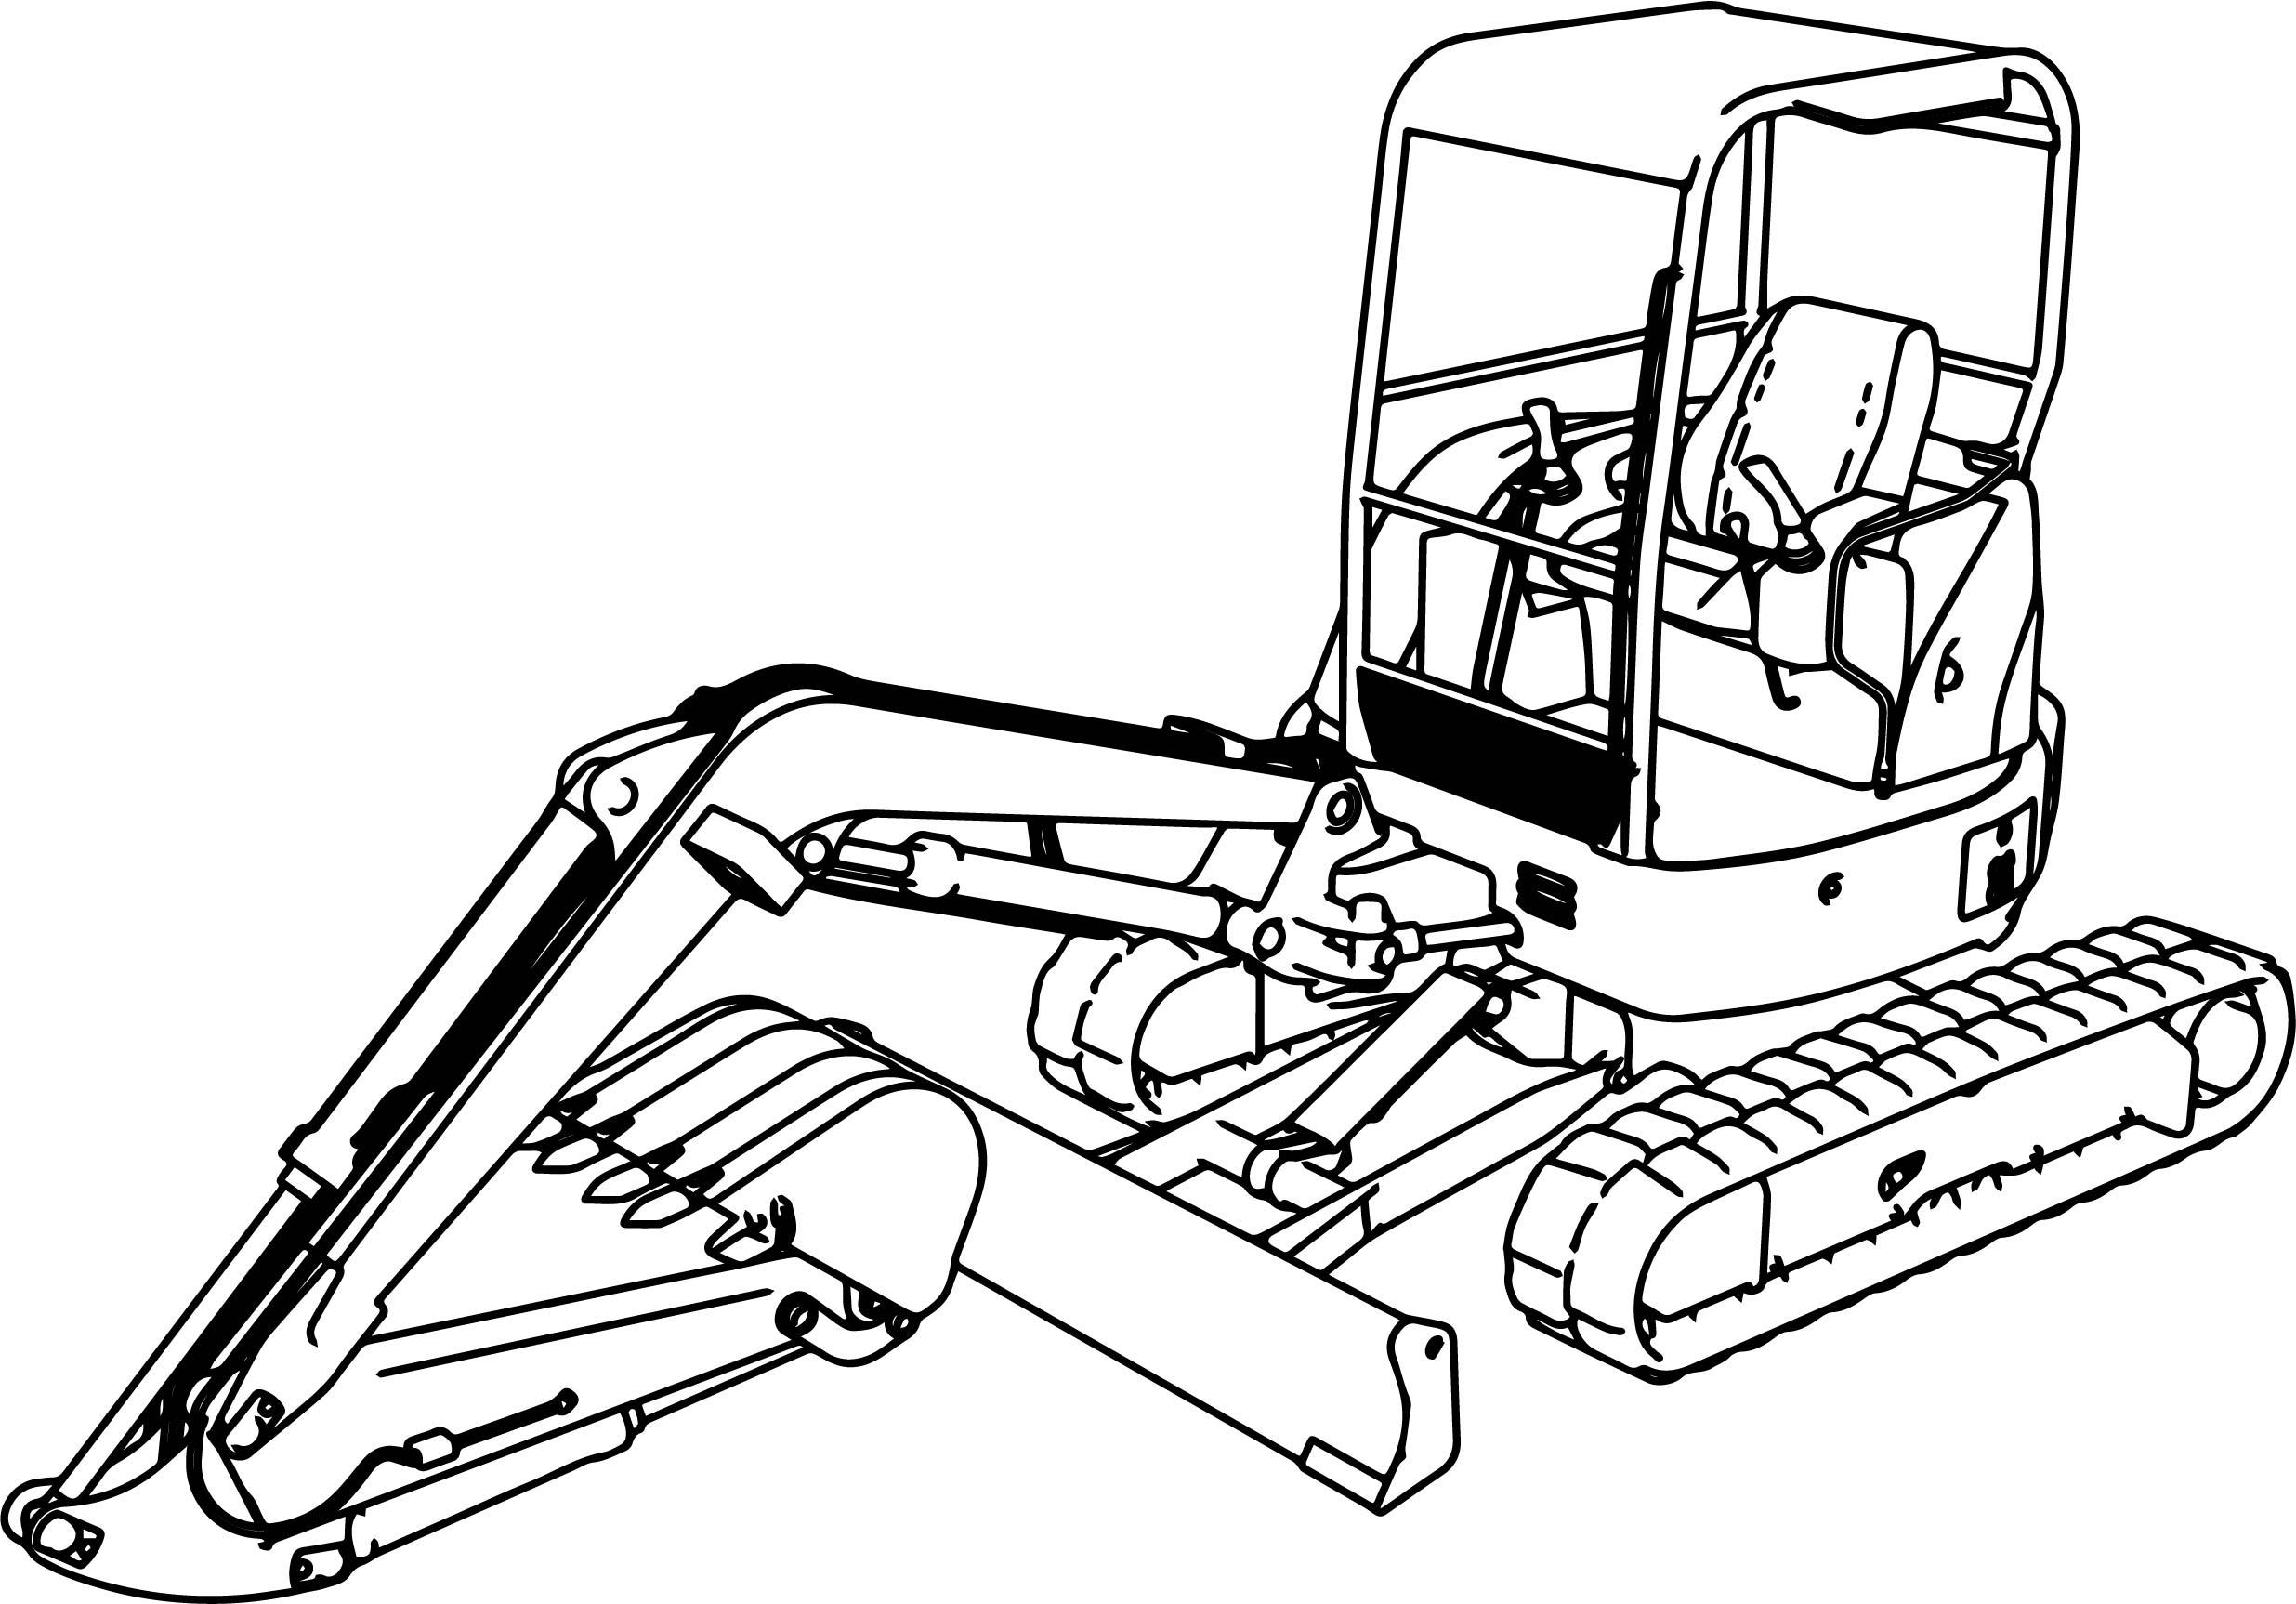 excavator mini excavator hitachi ex50u coloring page - Horse Trailer Coloring Pages